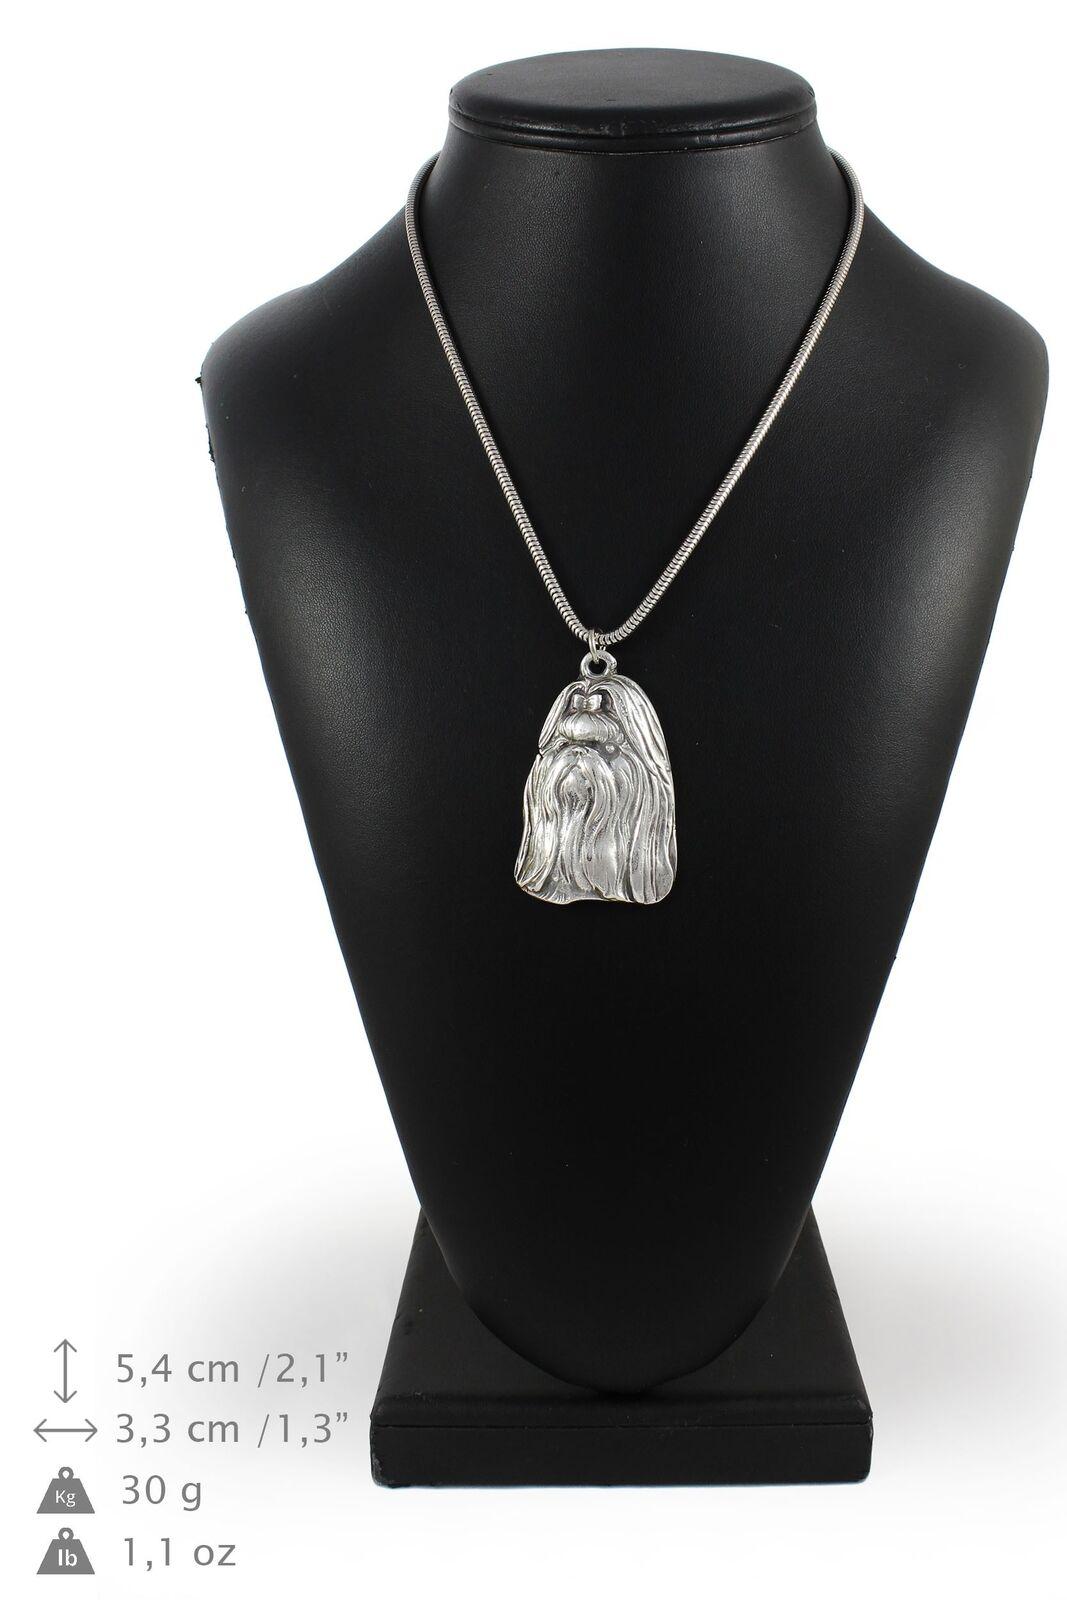 Shih Tzu type 2 - collier en Silber plaqué sur une chaîne en Silber Art Dog FR